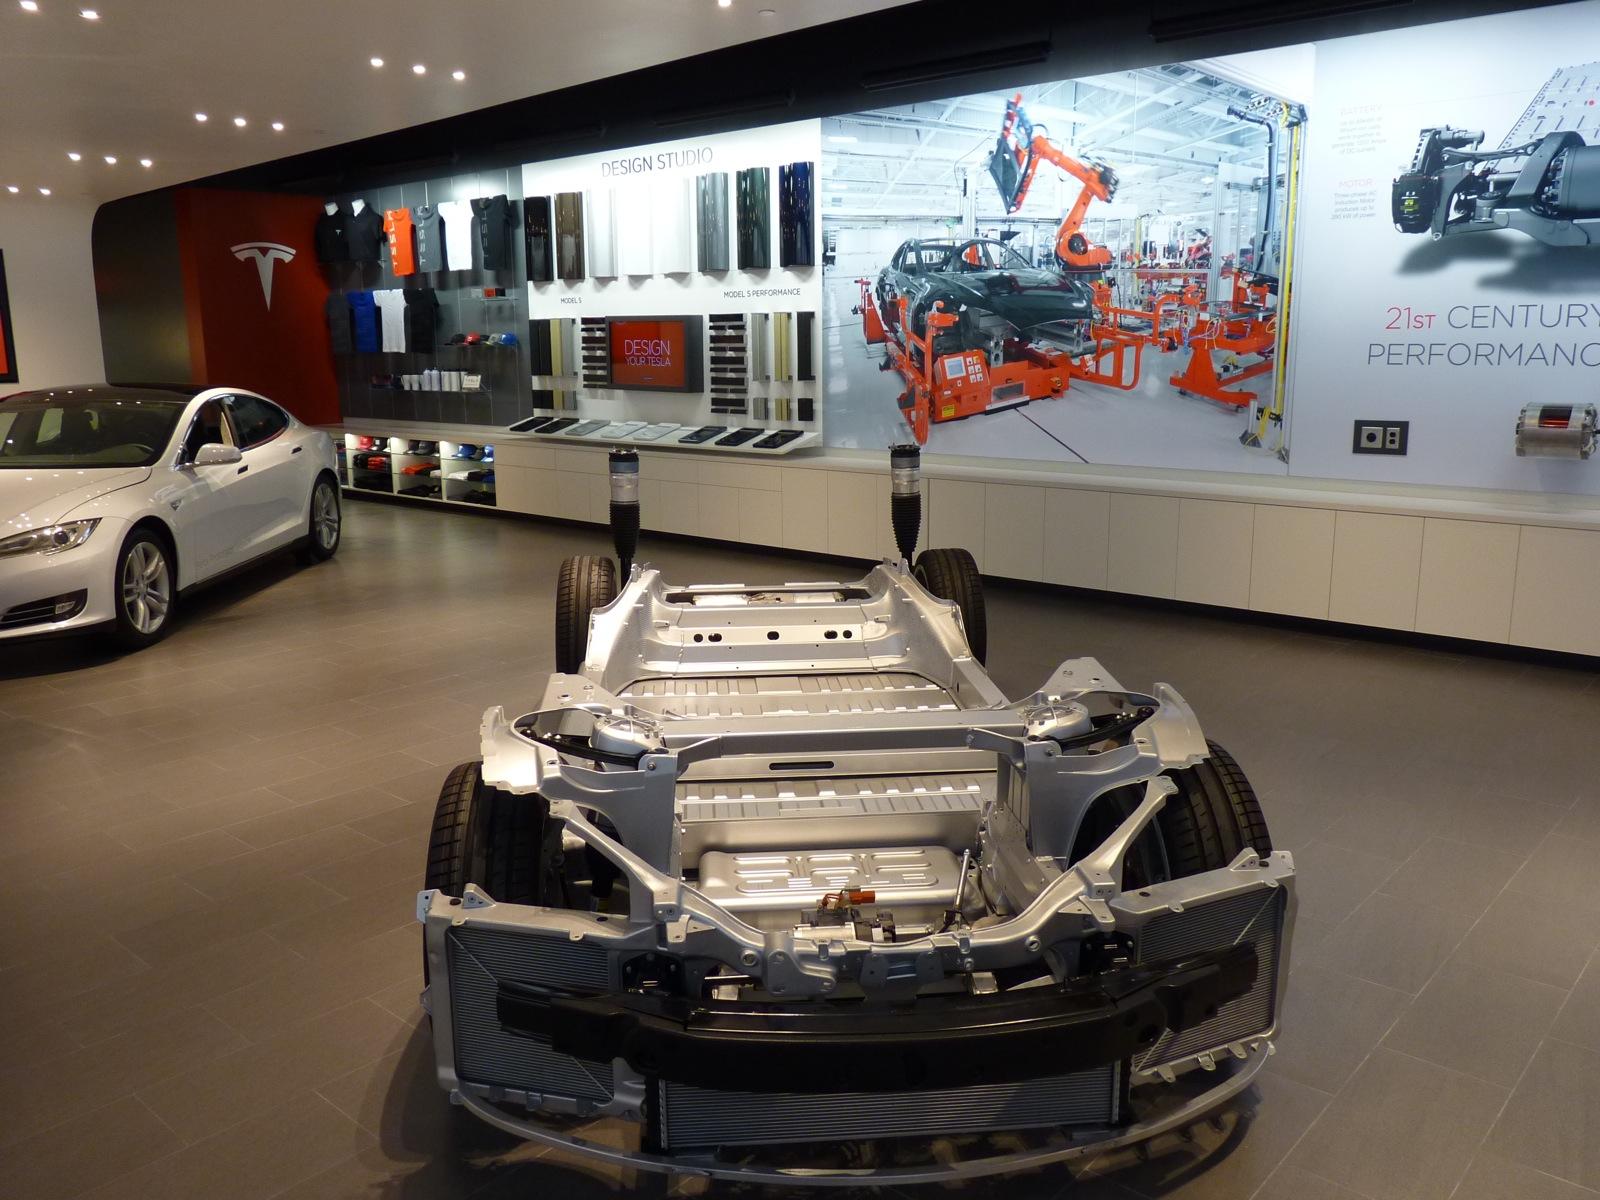 Ma Auto Dealers Suit Against Tesla Dismissed By Judge